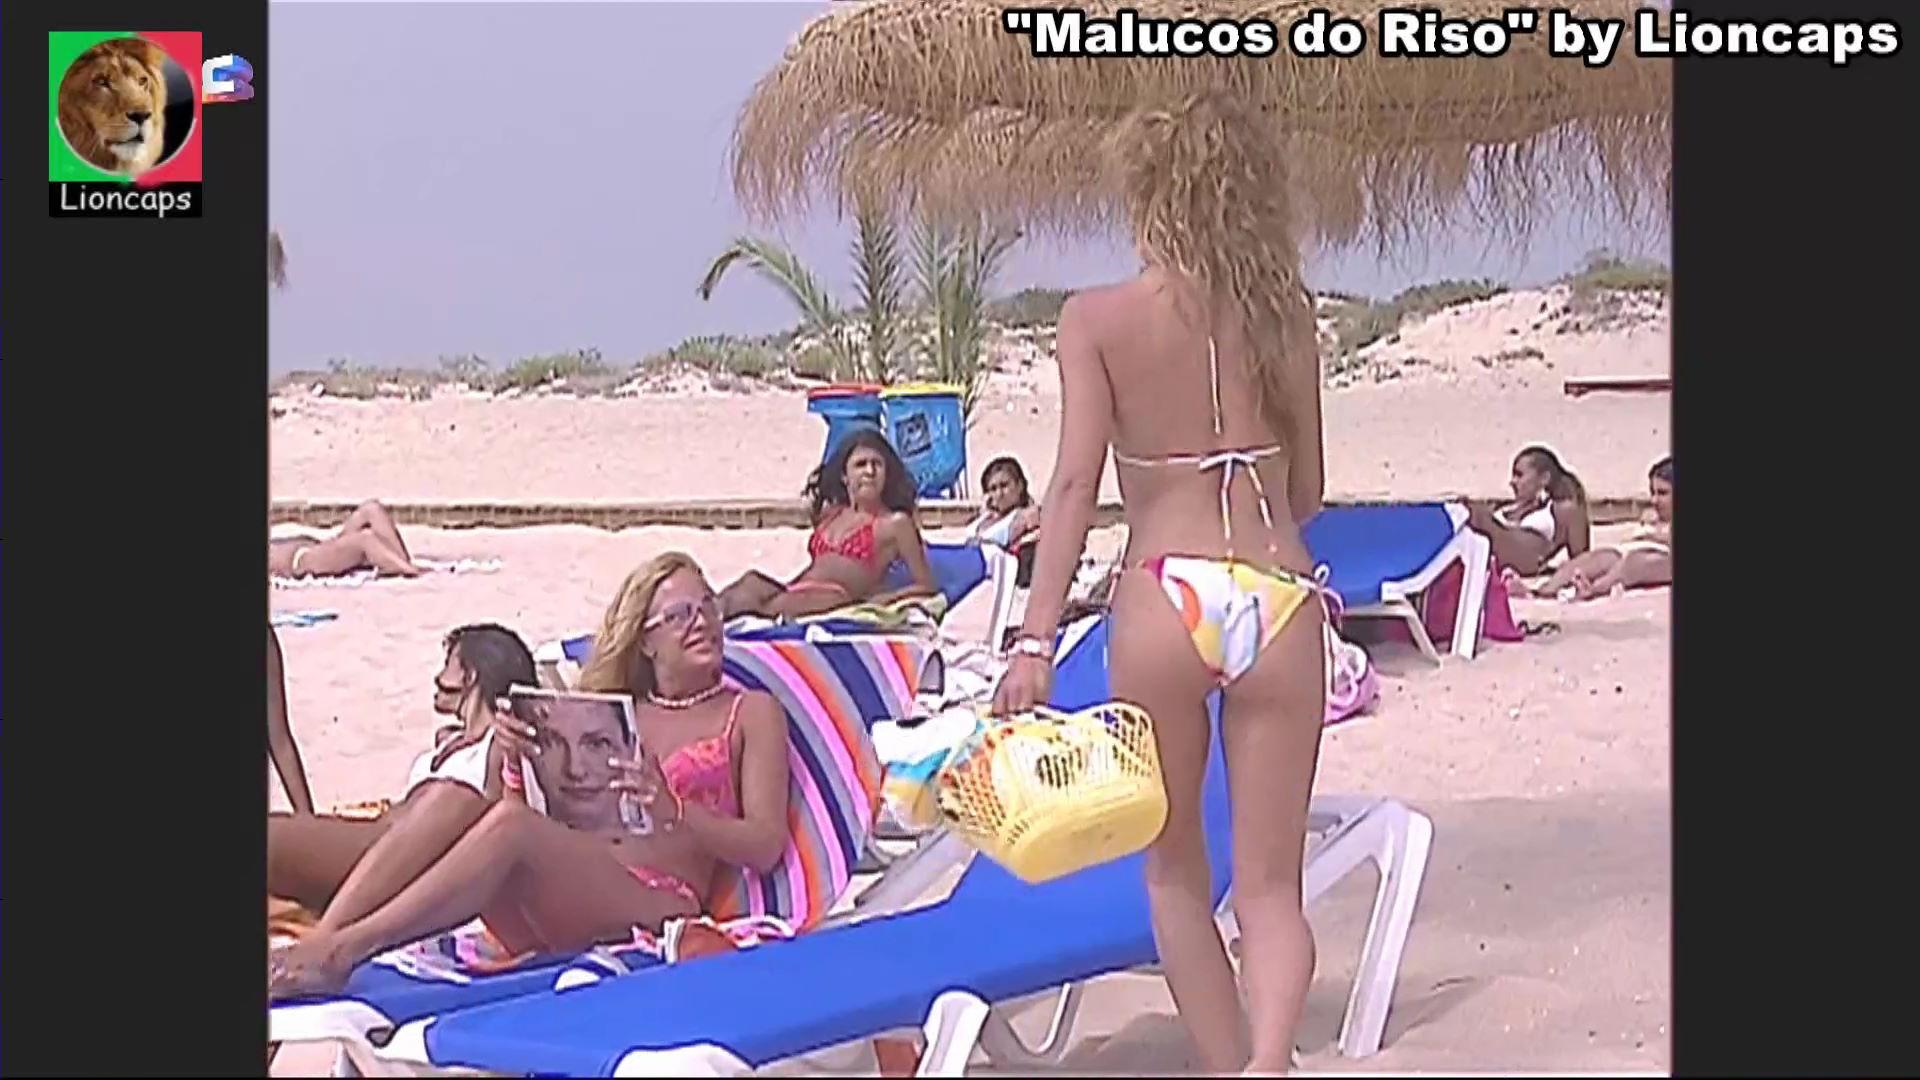 947517479_malucos_riso_alda_gomes_vs190malucos_riso_602_15079_122_113lo.JPG